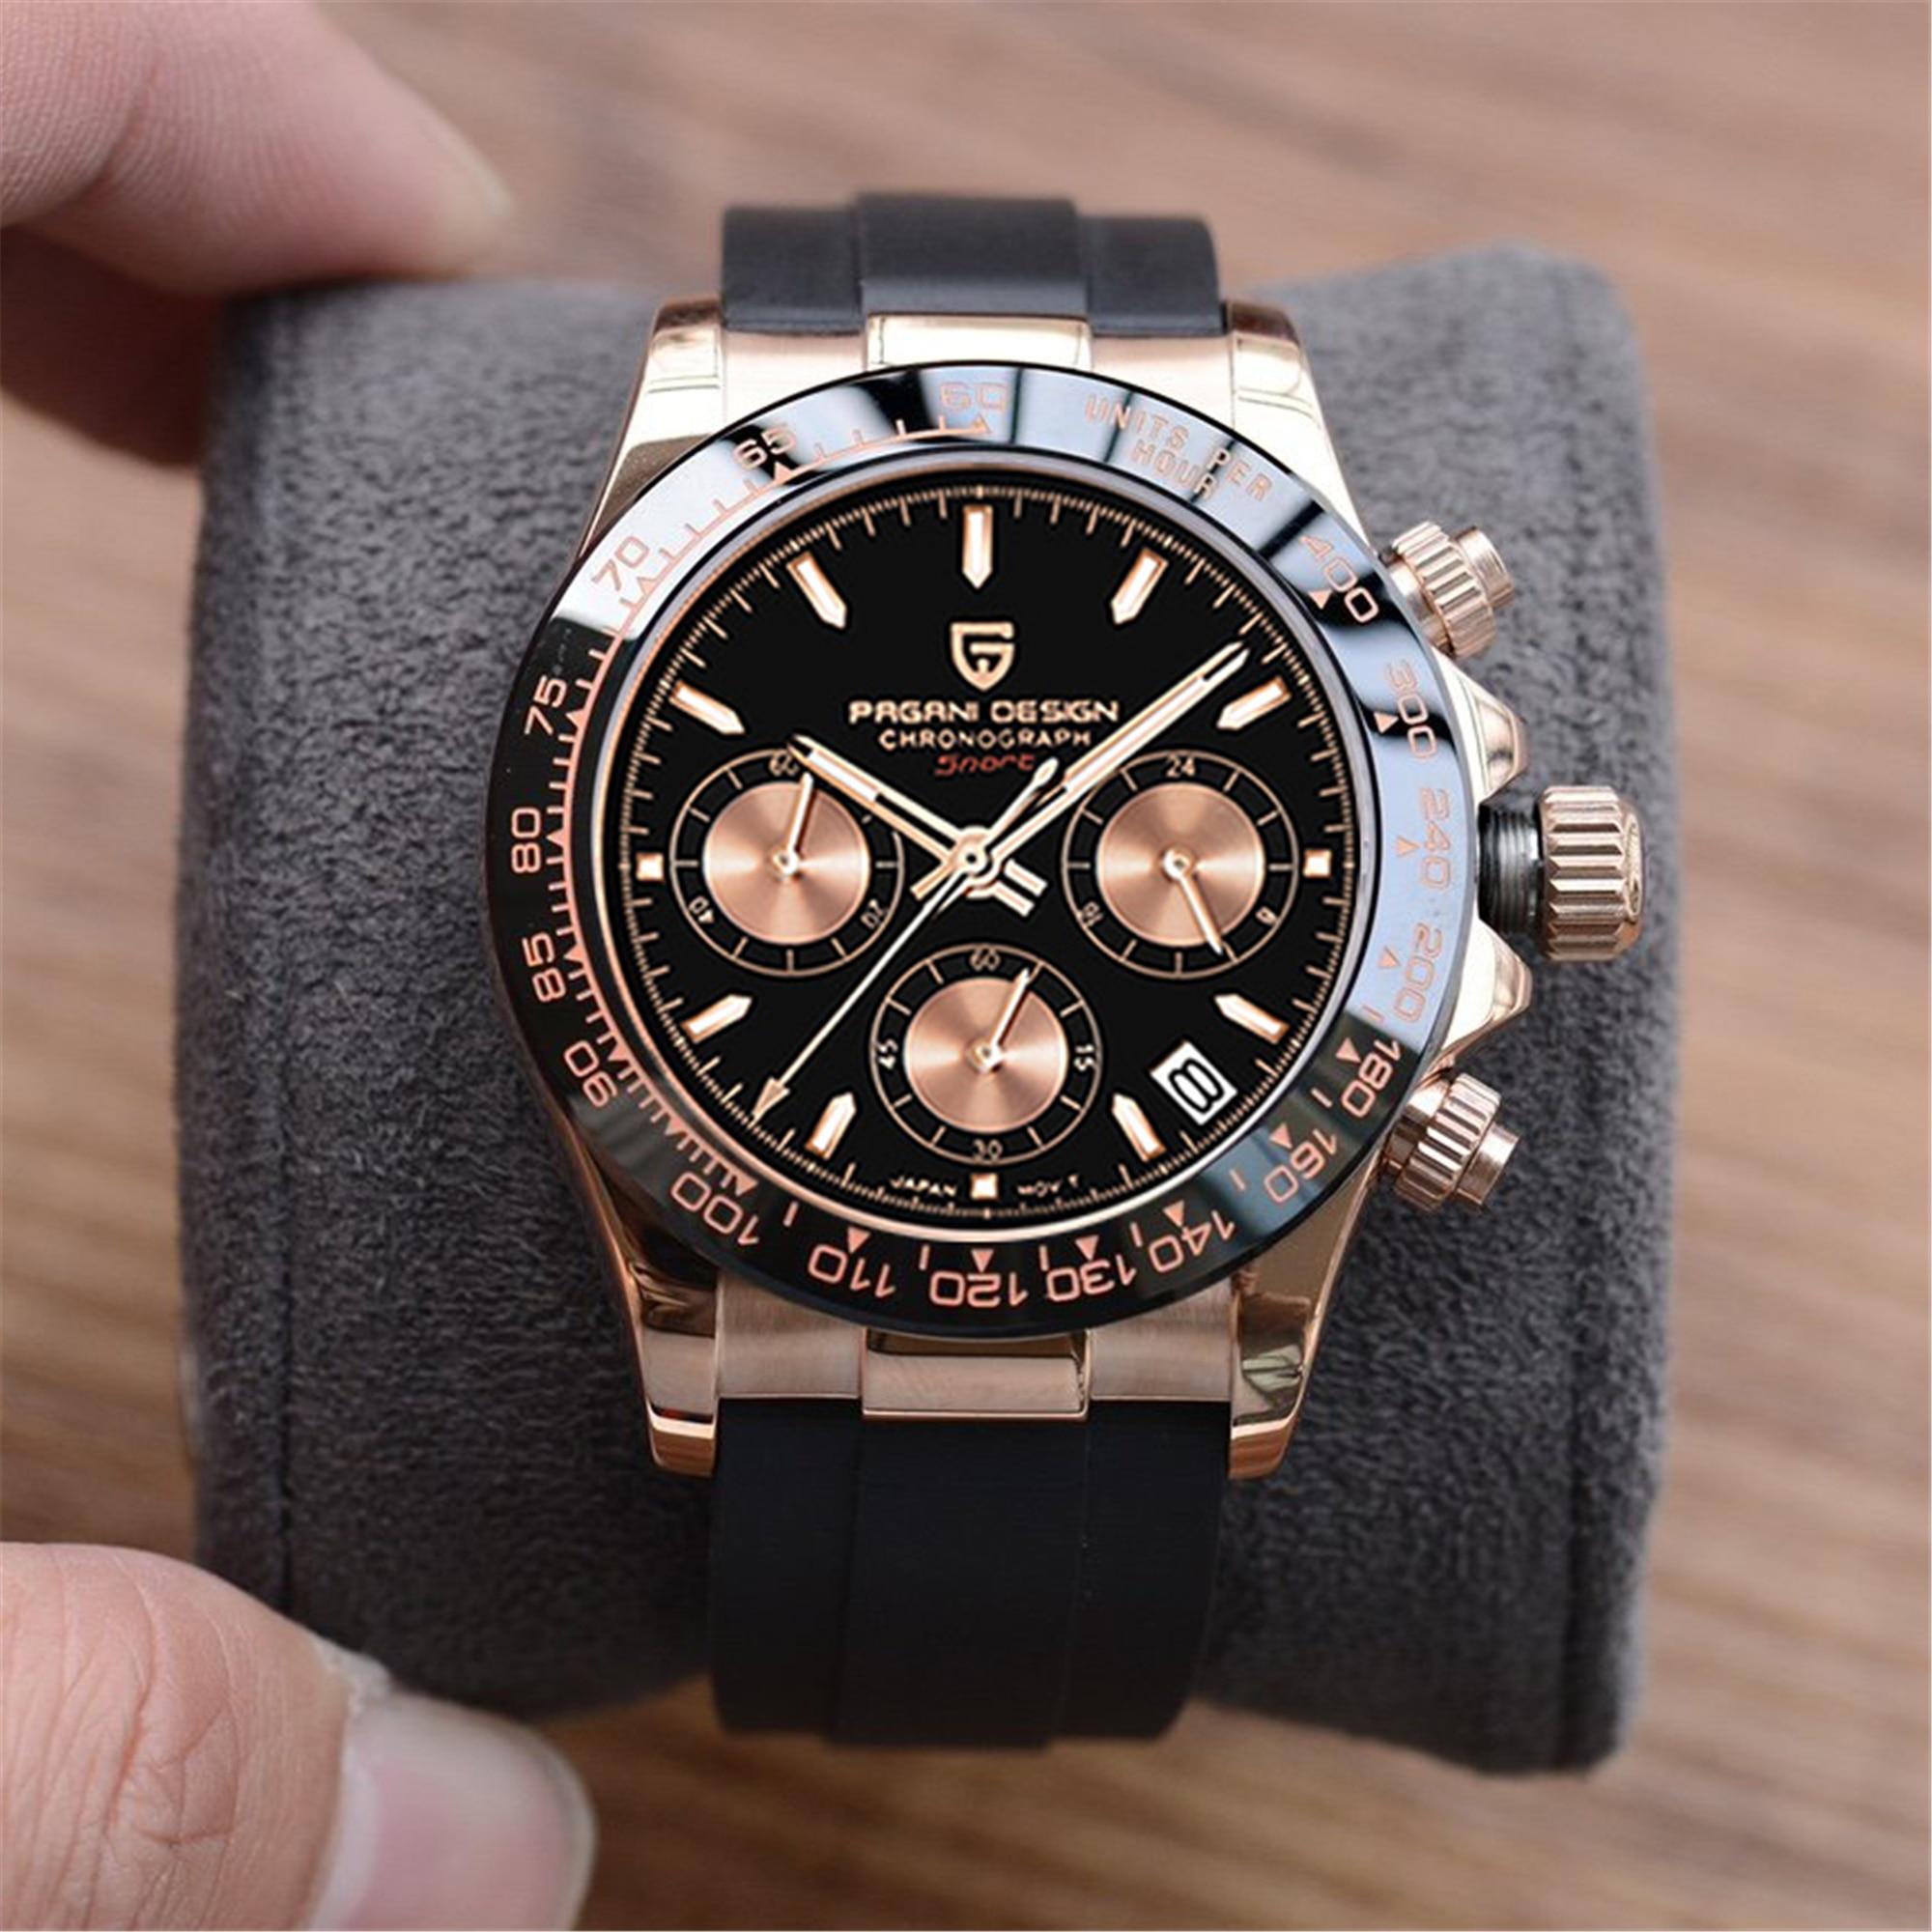 2021 New PAGANI Design Men Quartz Watches Japan VK63 Clock Automatic Date Men Luxury Chronograph Wri